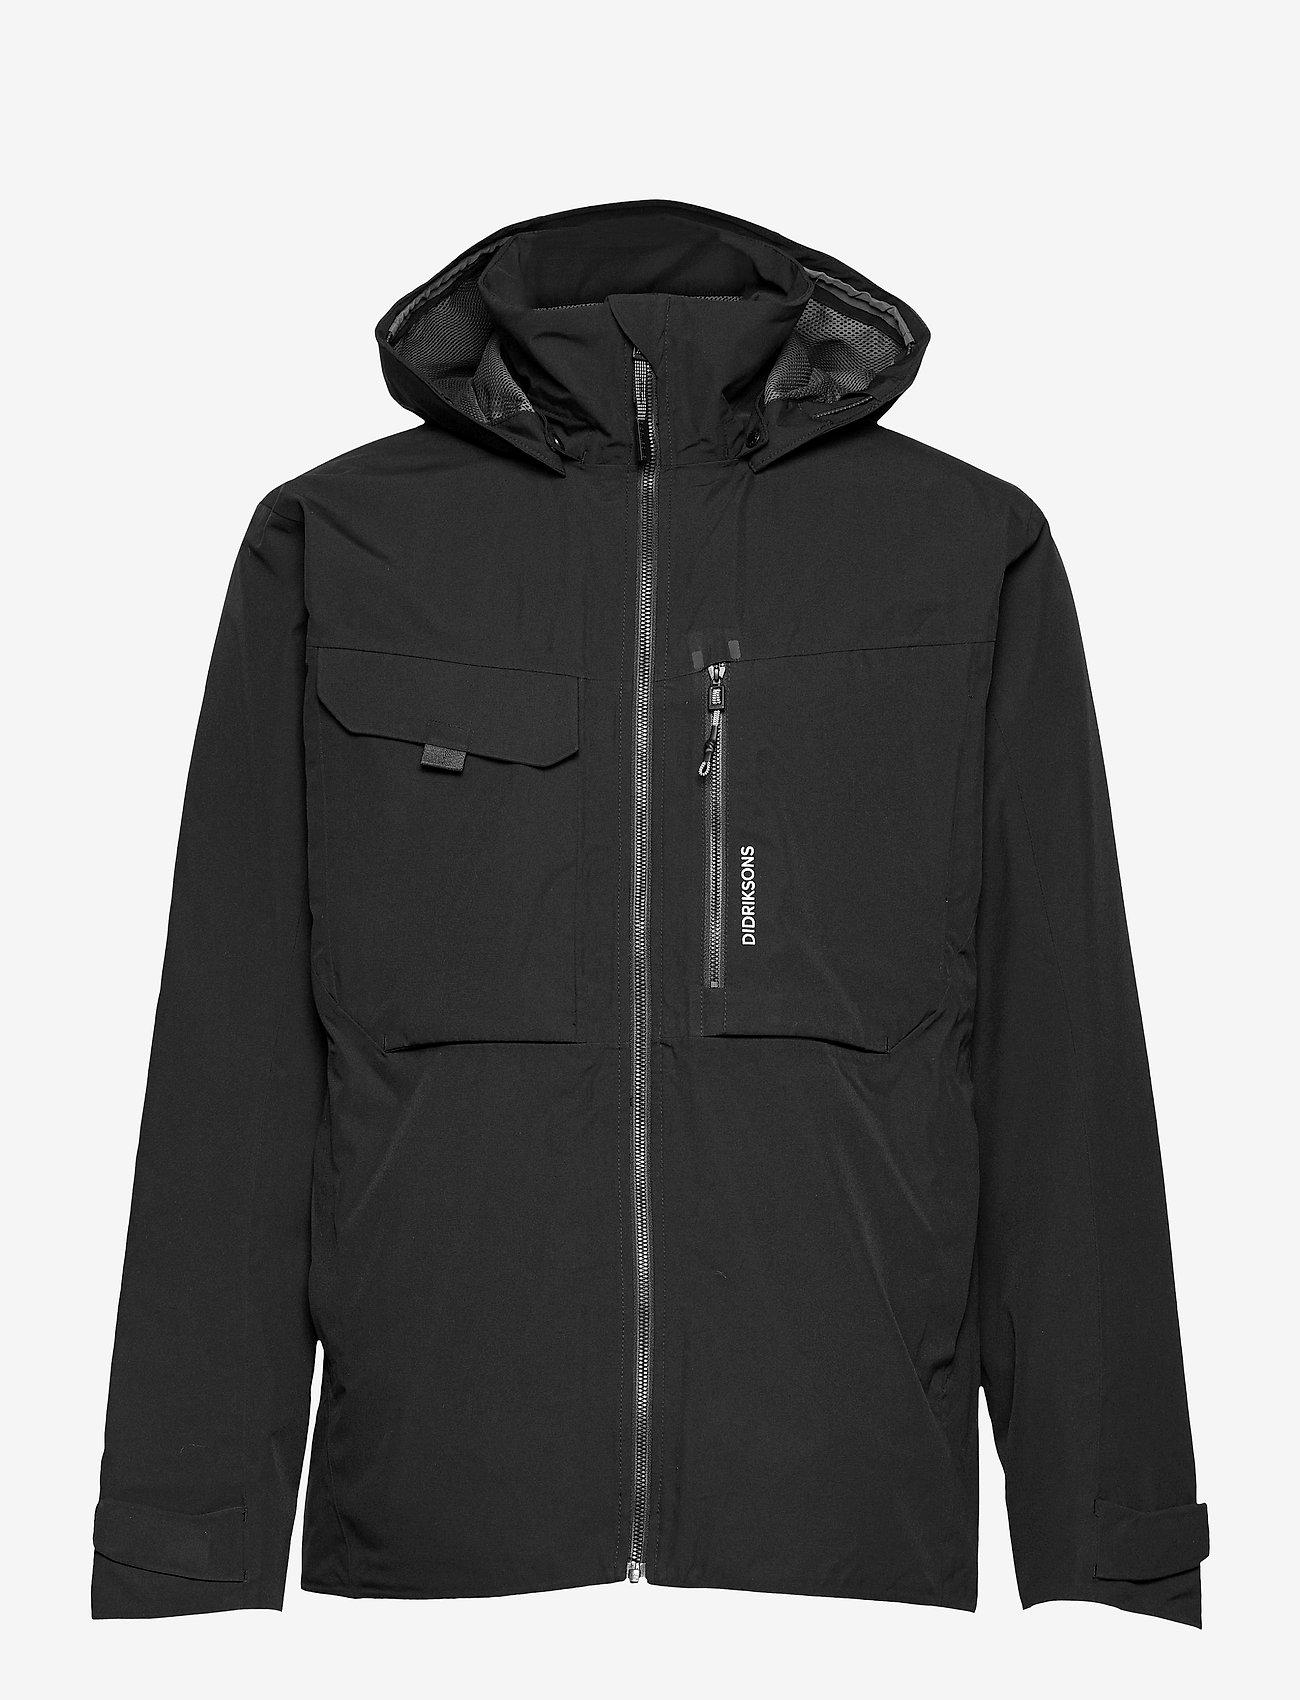 Didriksons - ASTON USX JKT 2 - vestes légères - black - 1